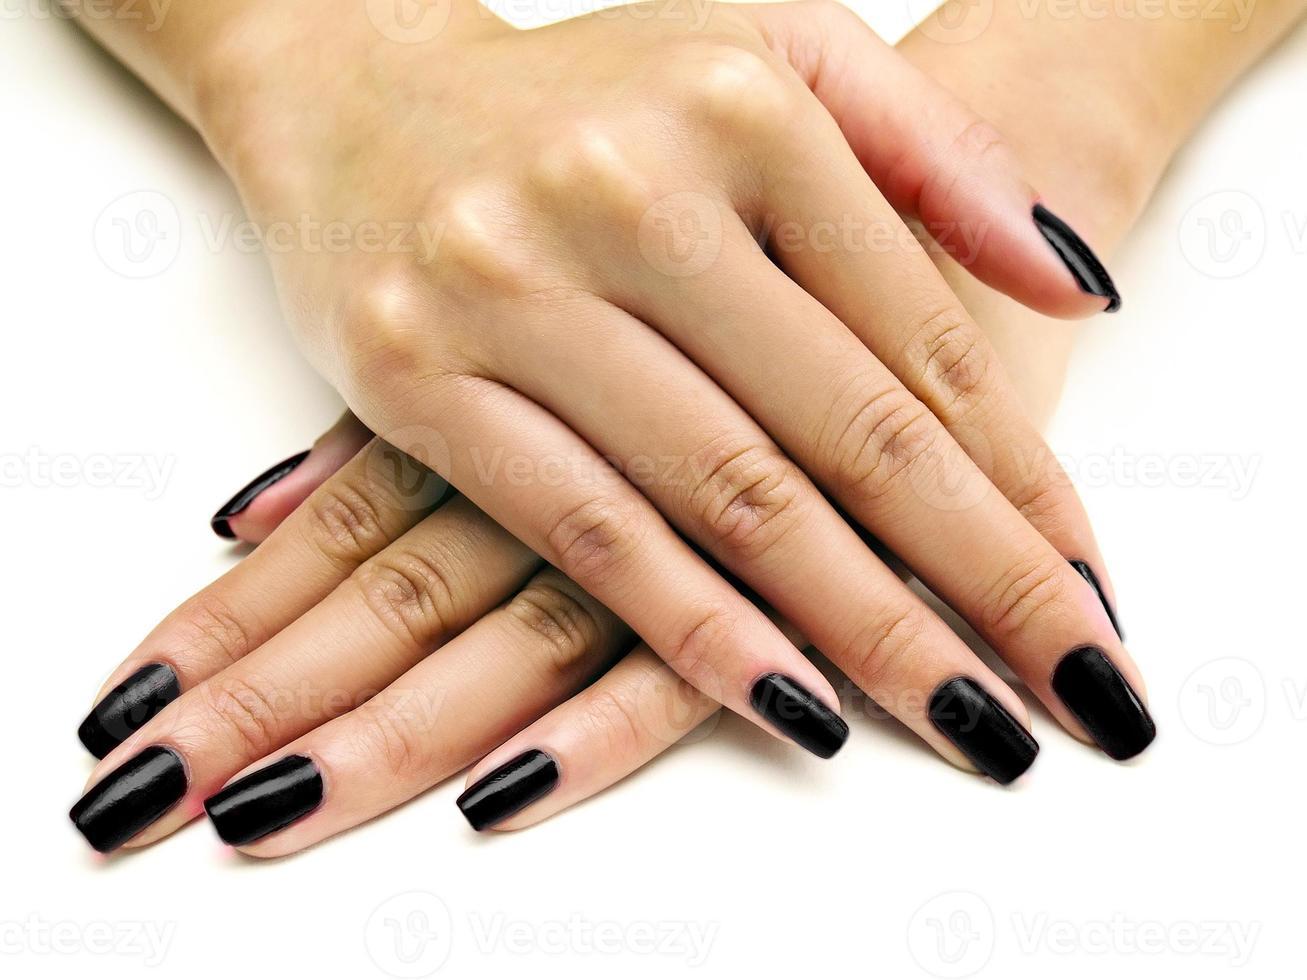 Nail Polish on Female Hands photo